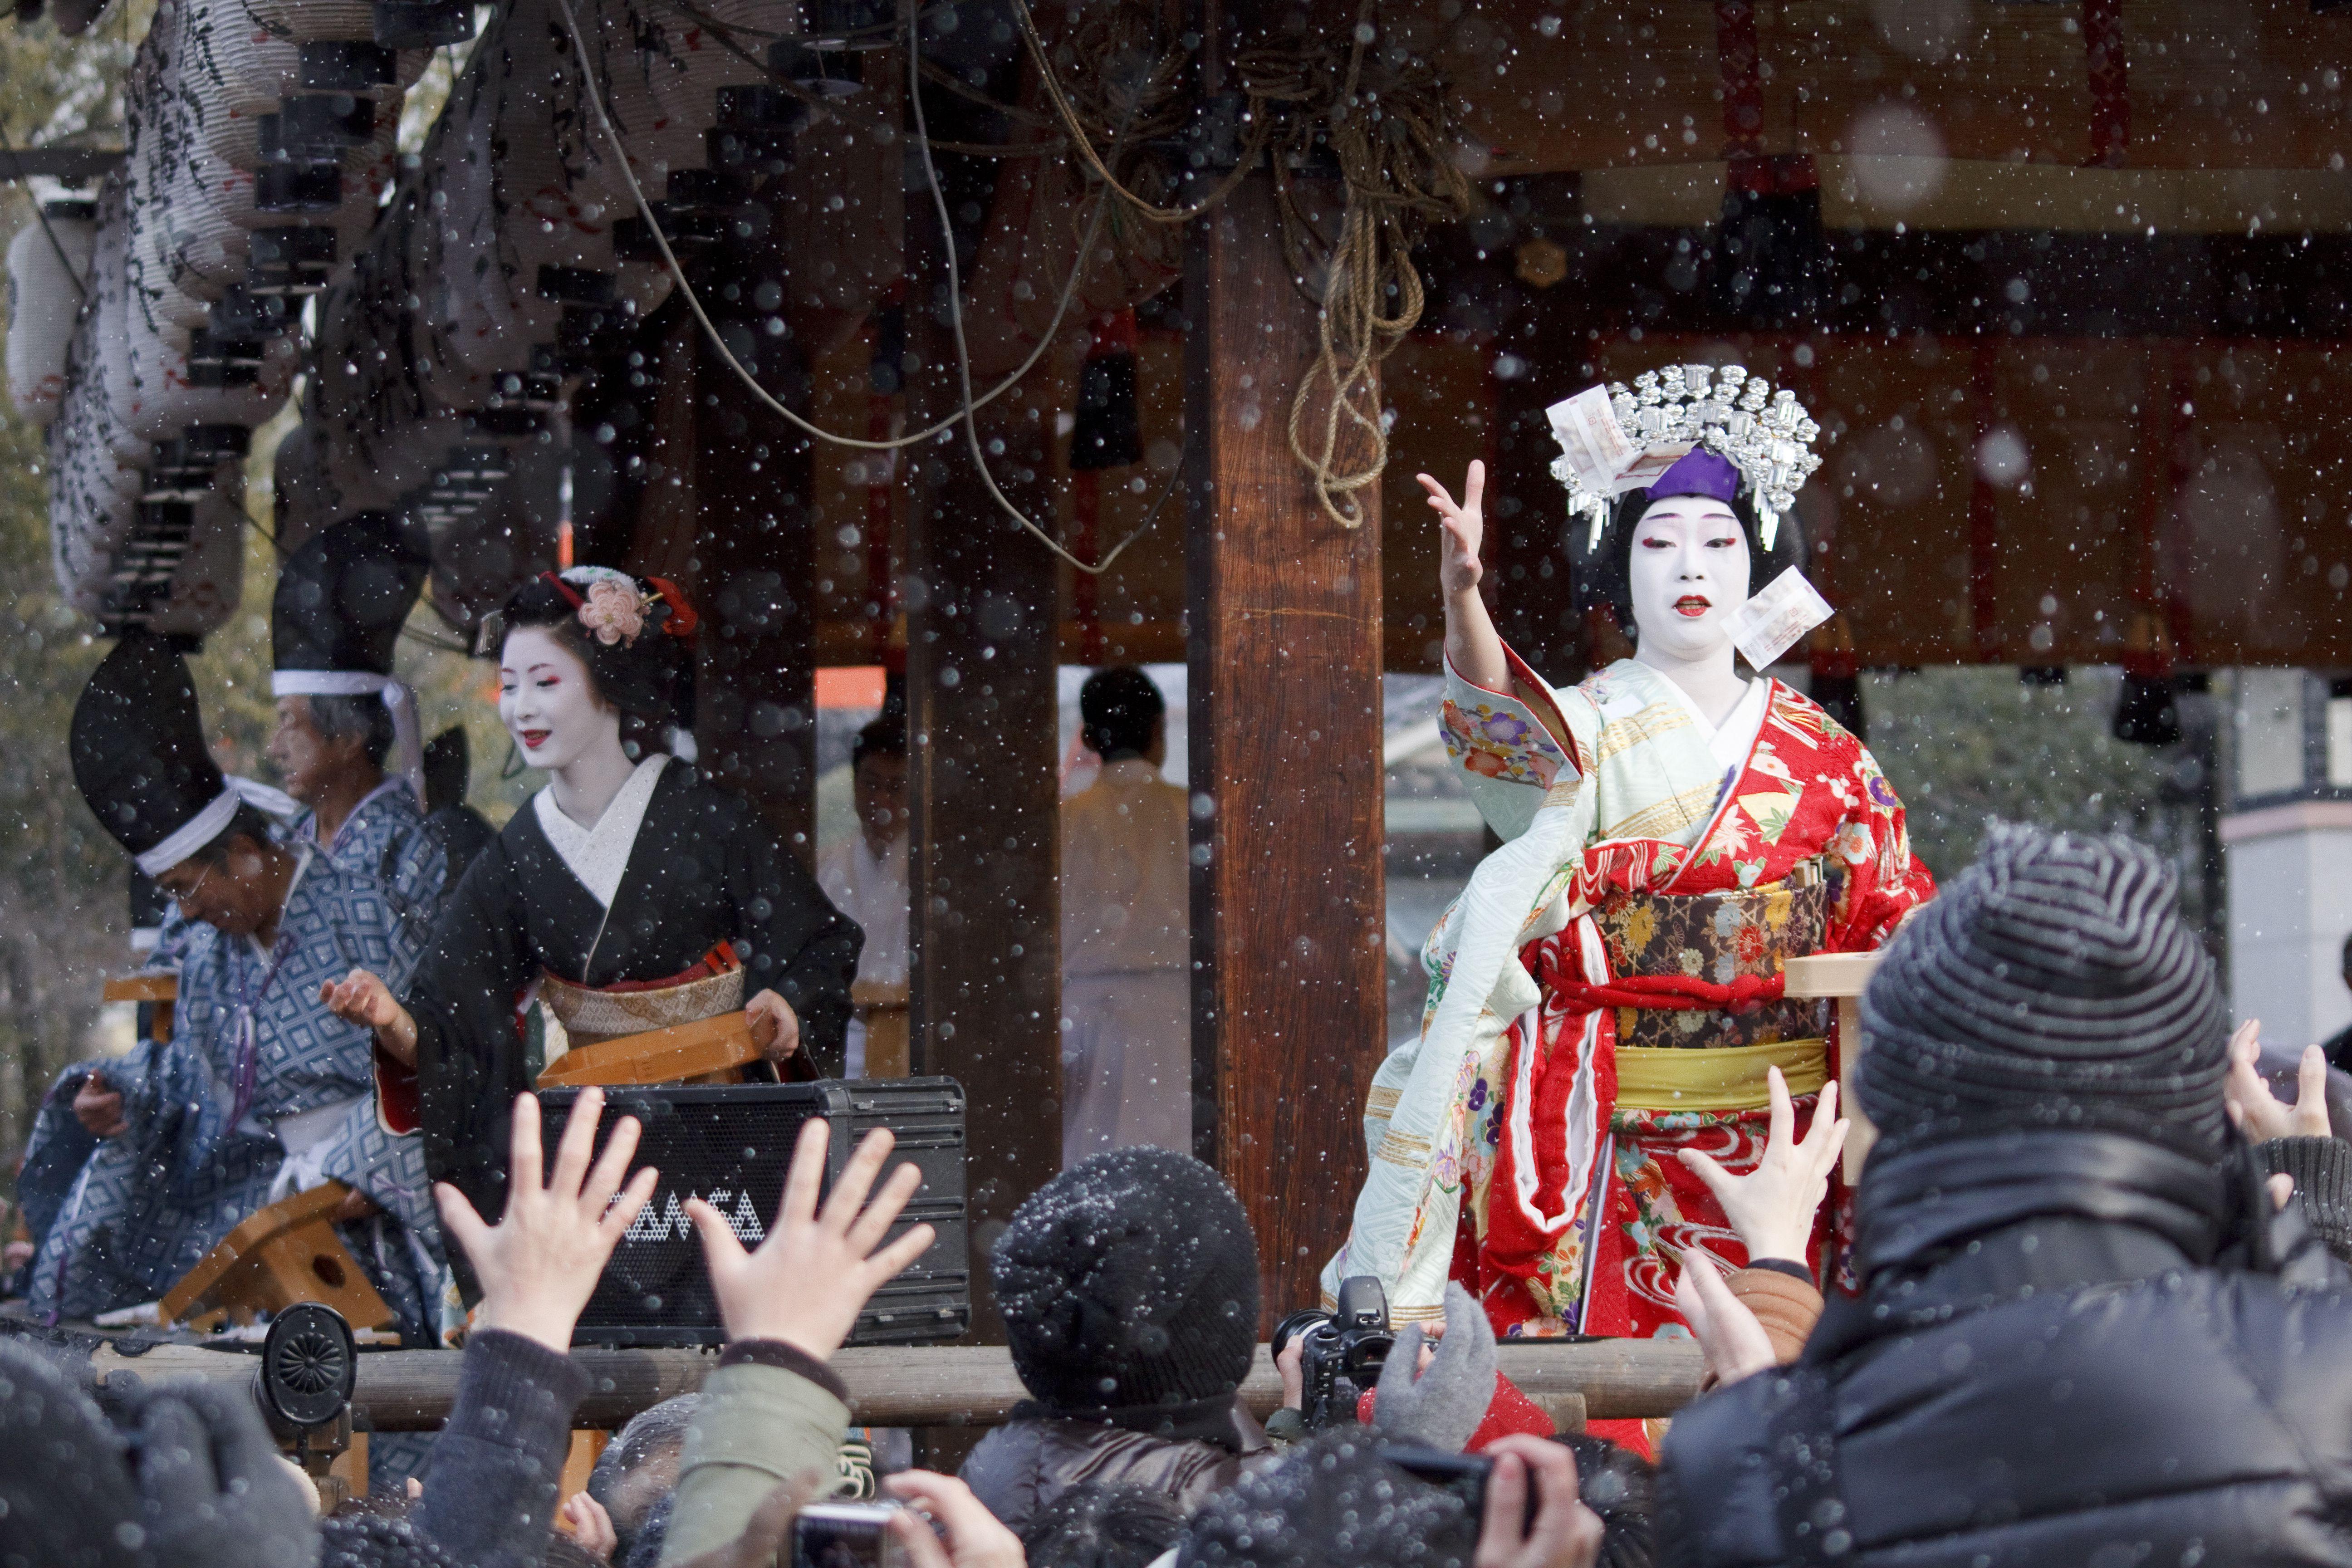 The Setsubun bean throwing festival in Kyoto, Japan